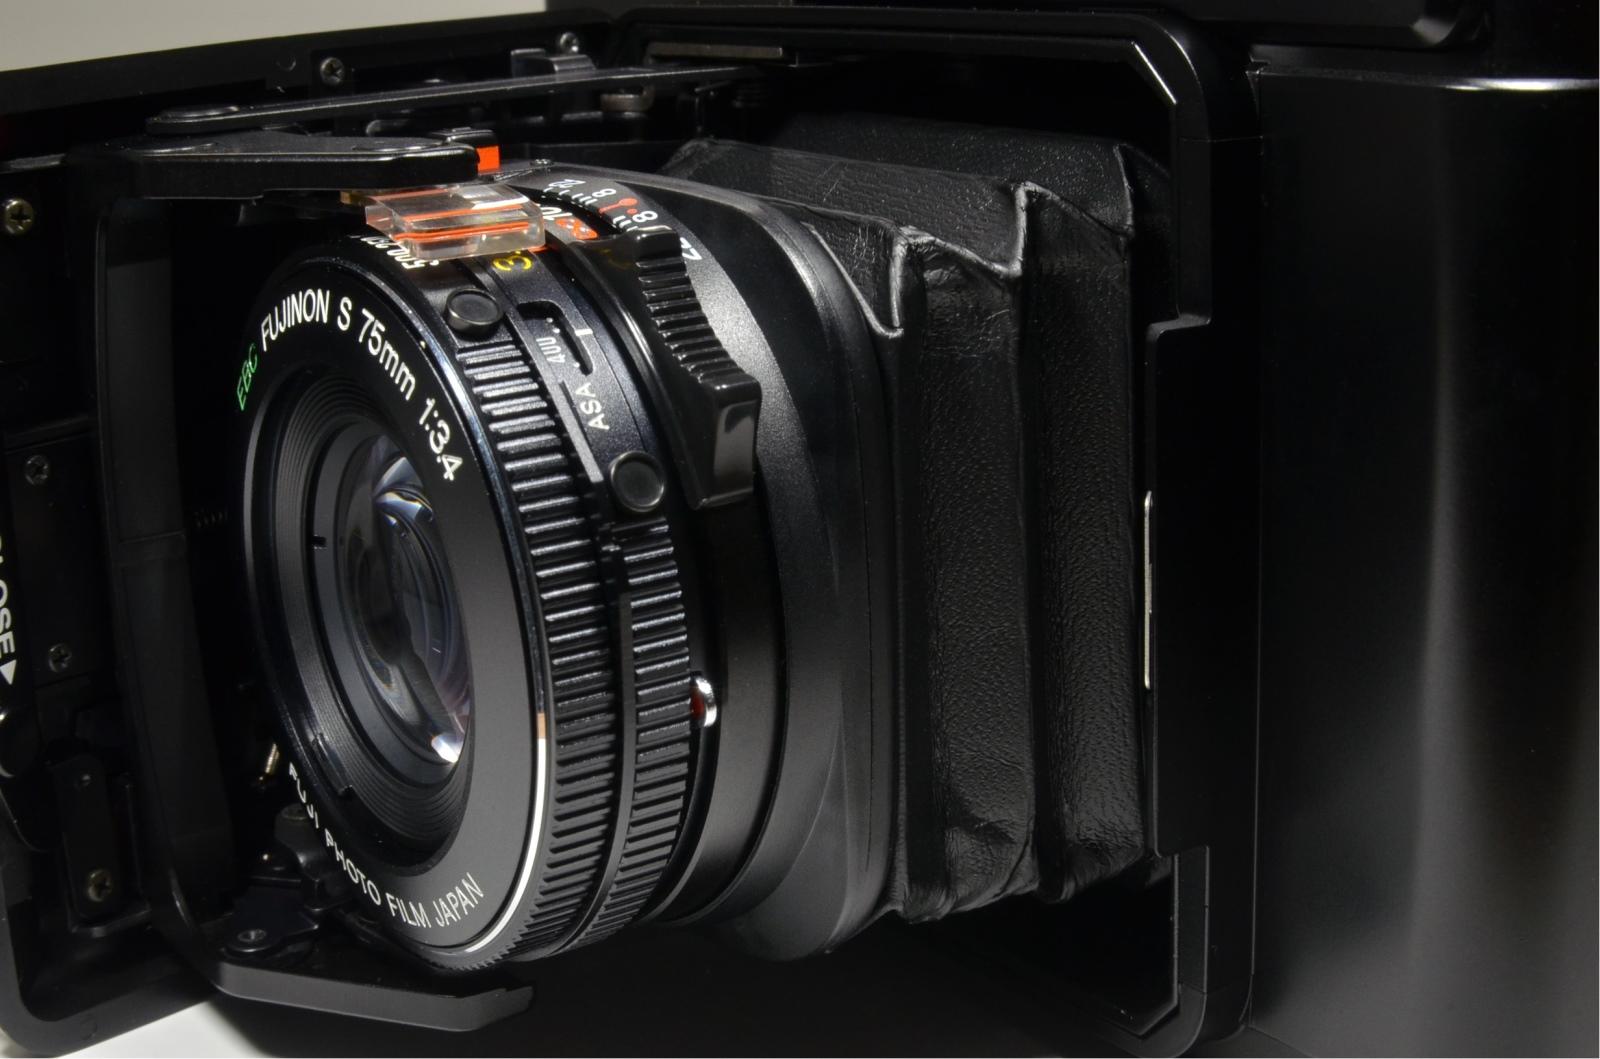 fujifilm fujica gs645 medium format film camera 75mm f3.4